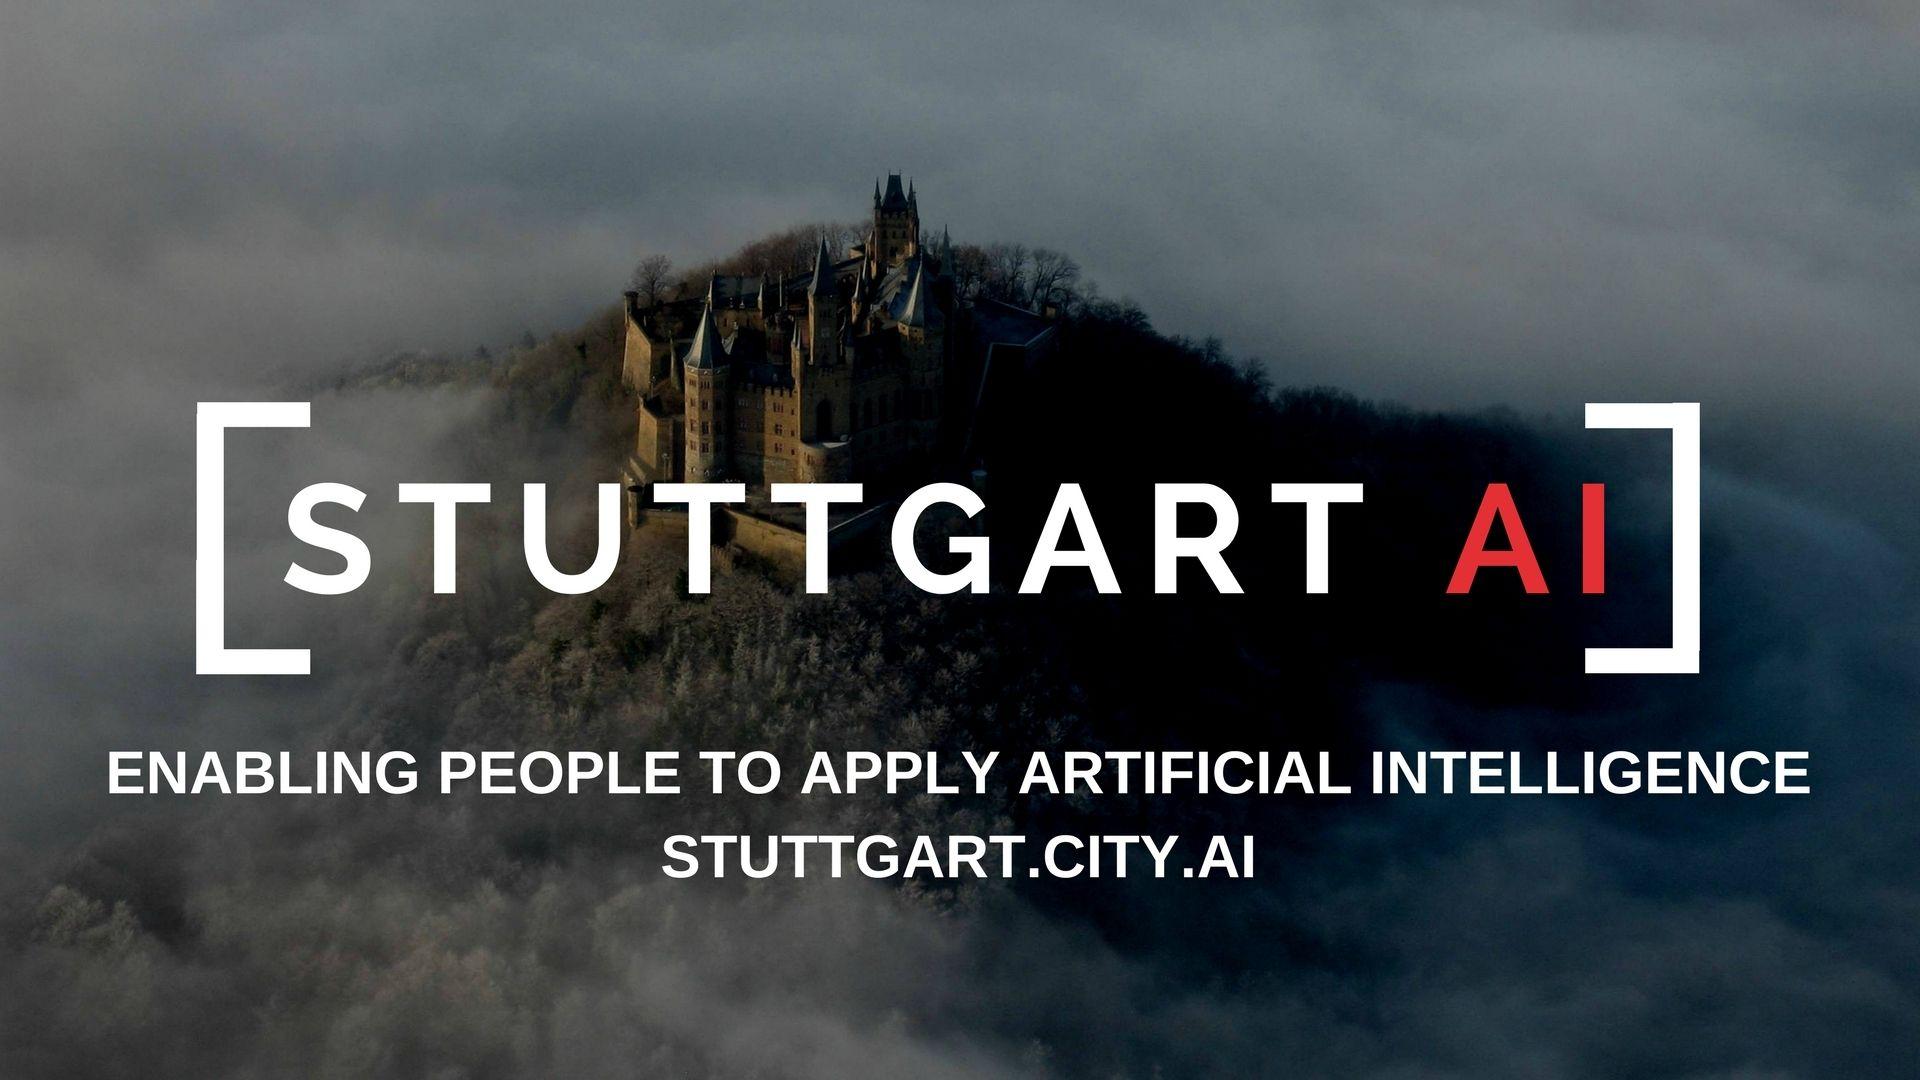 Stuttgart AI